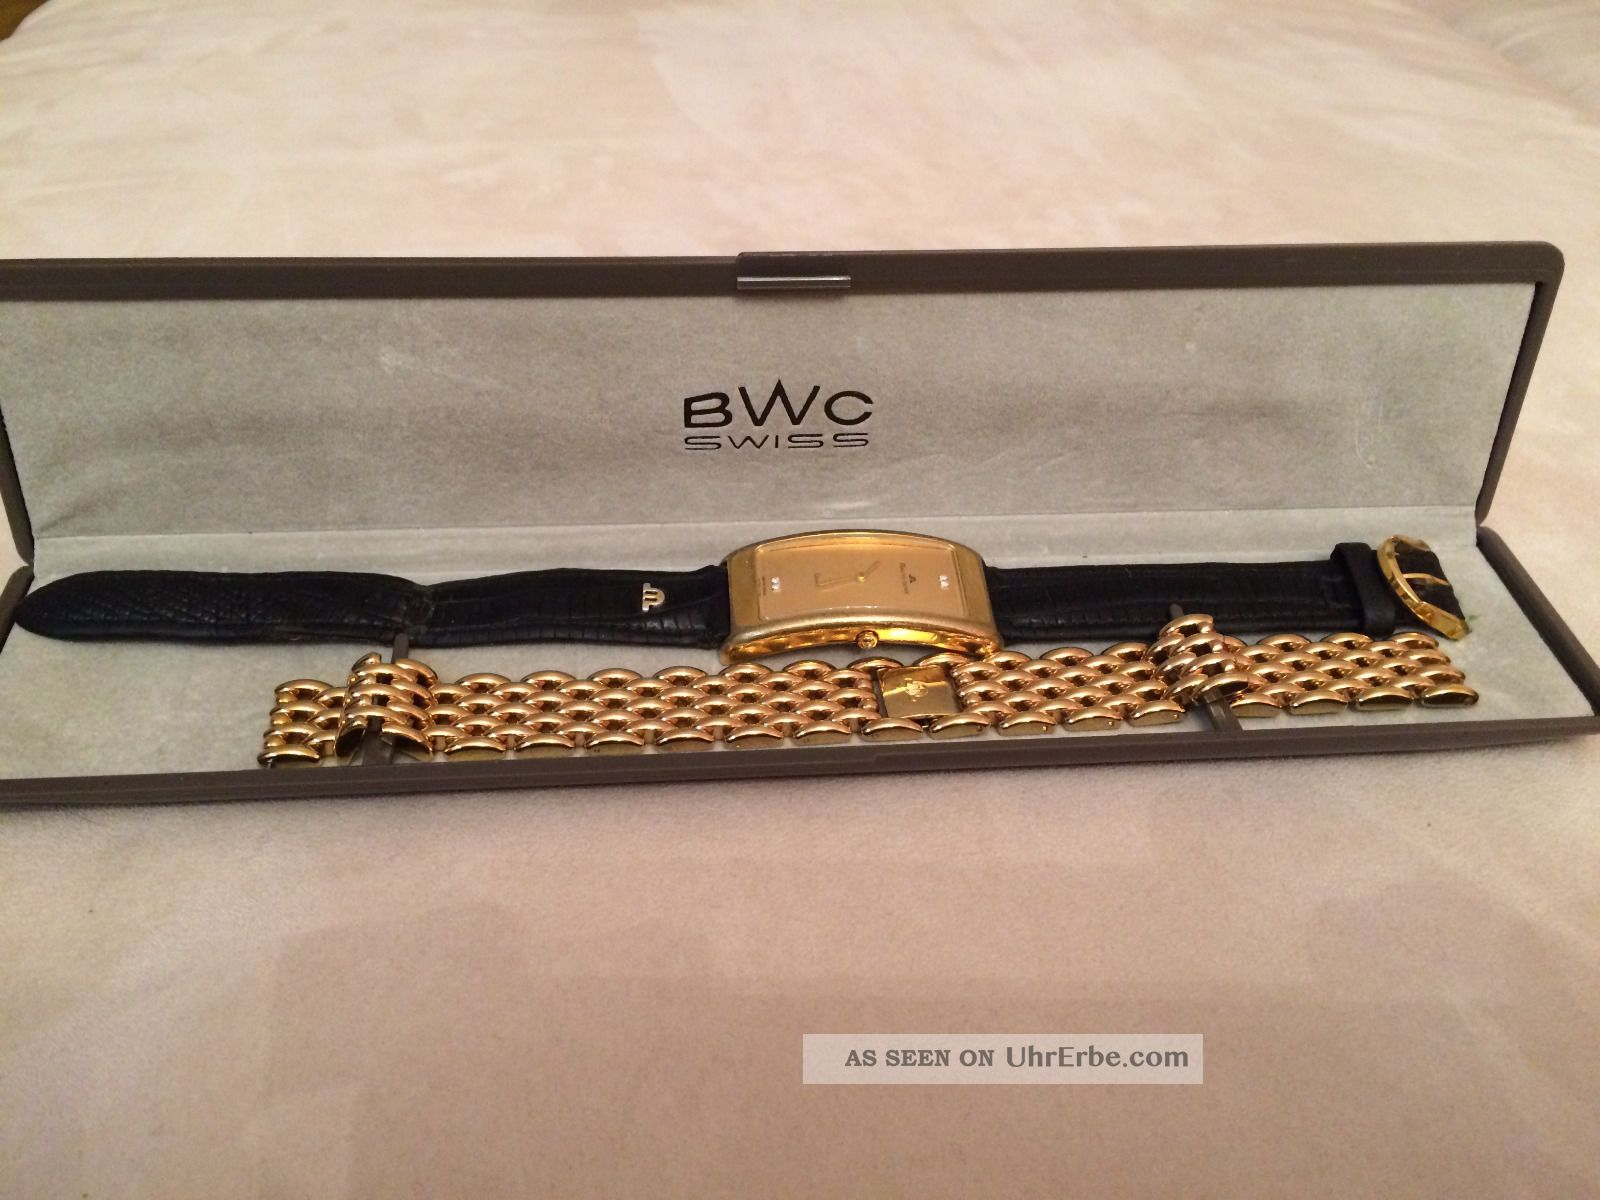 Maurice Lacroix Armbanduhr Für Damen Mit Ersatzarmband Armbanduhren Bild